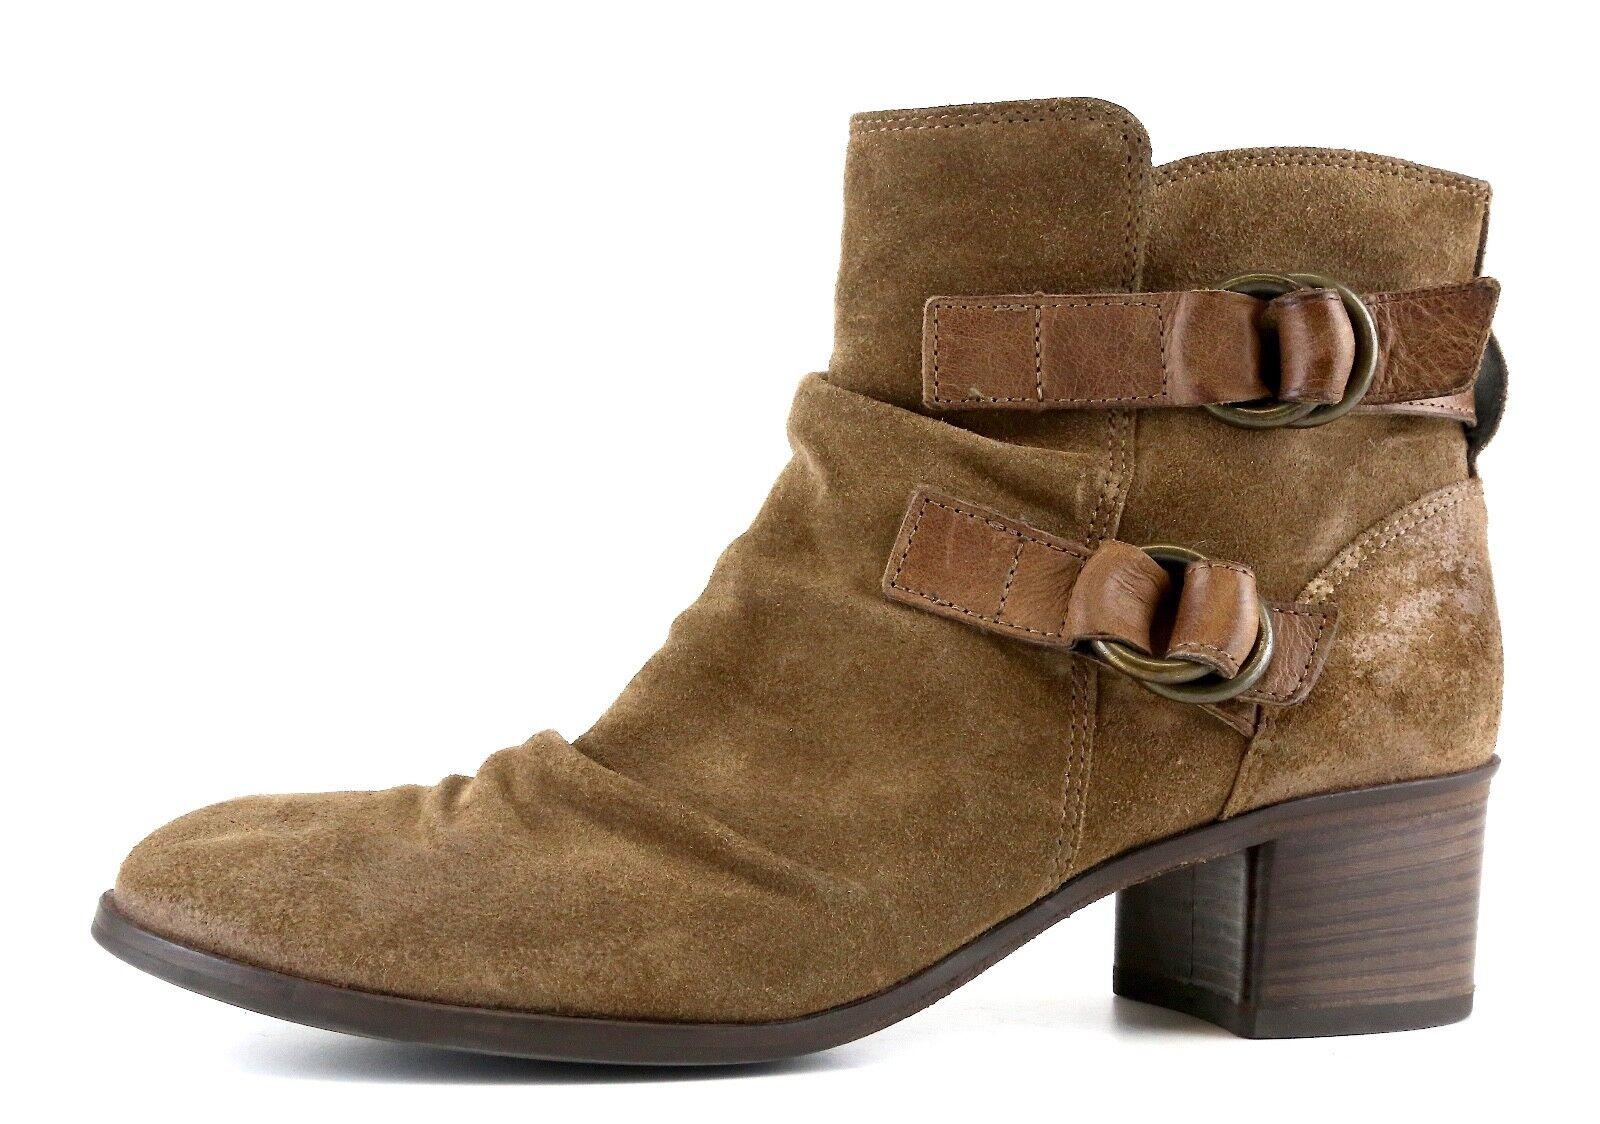 alla moda Paul verde Side Side Side Zip Suede Ankle stivali Marrone donna Sz 5   popolare